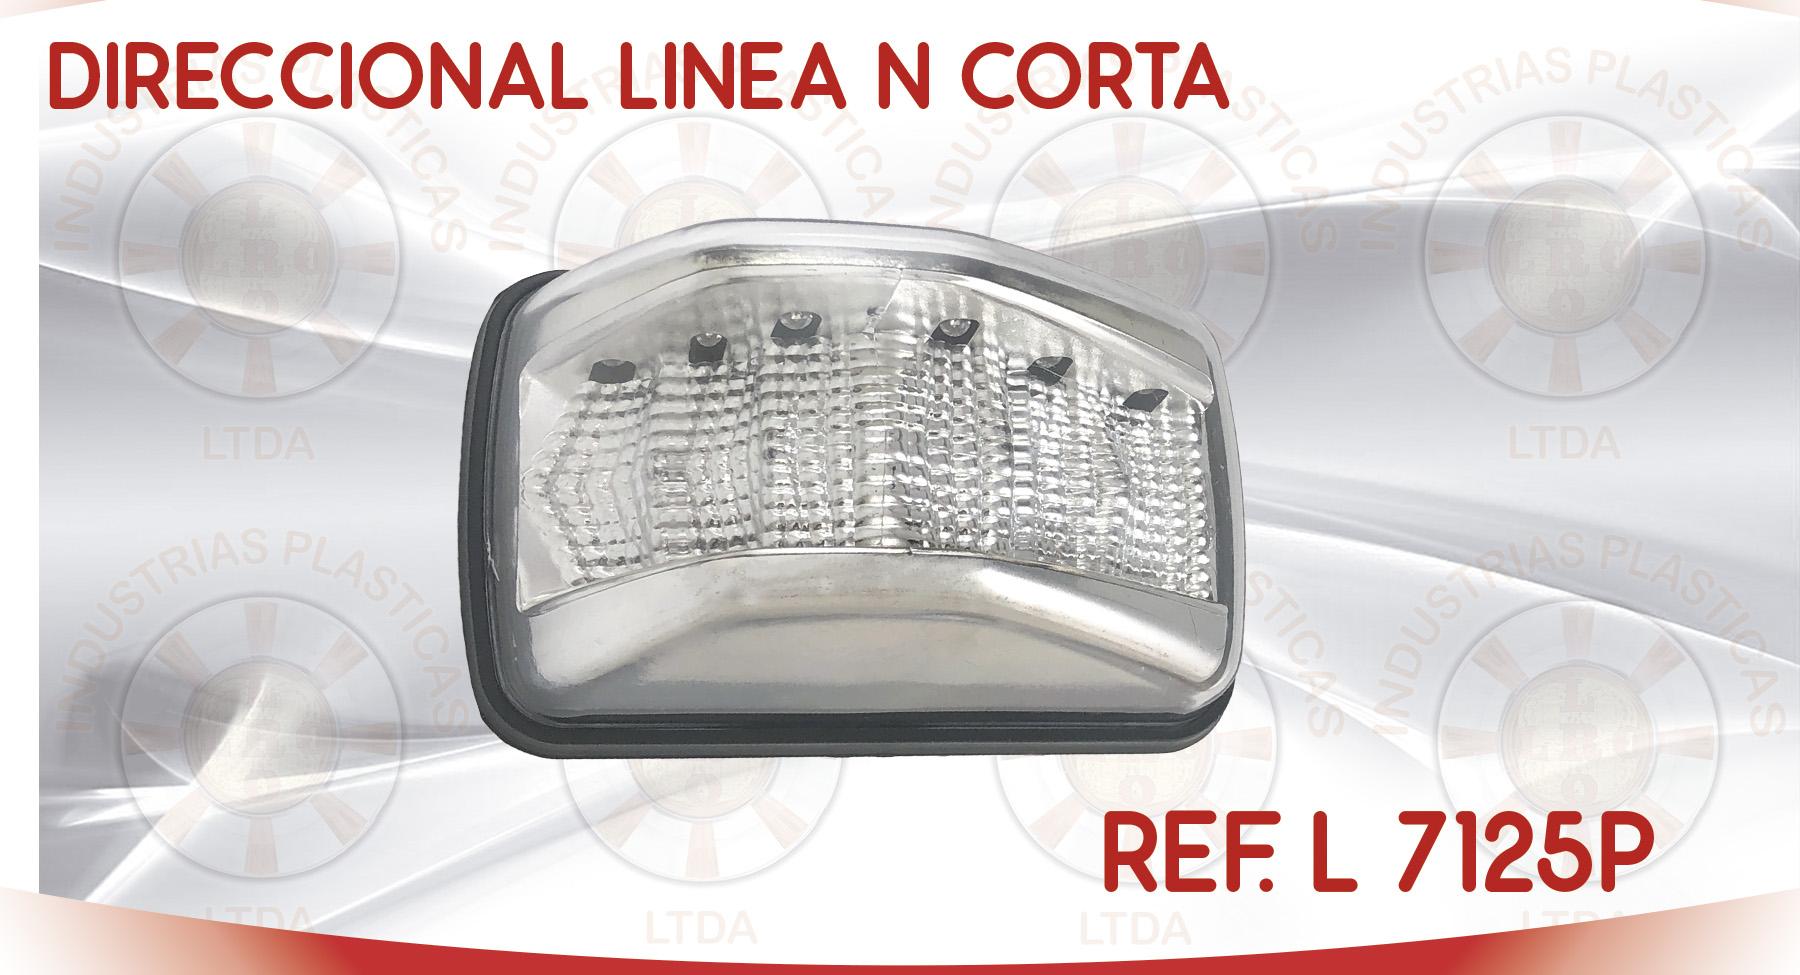 L 7125P DIRECCIONAL LINEA N CORTA